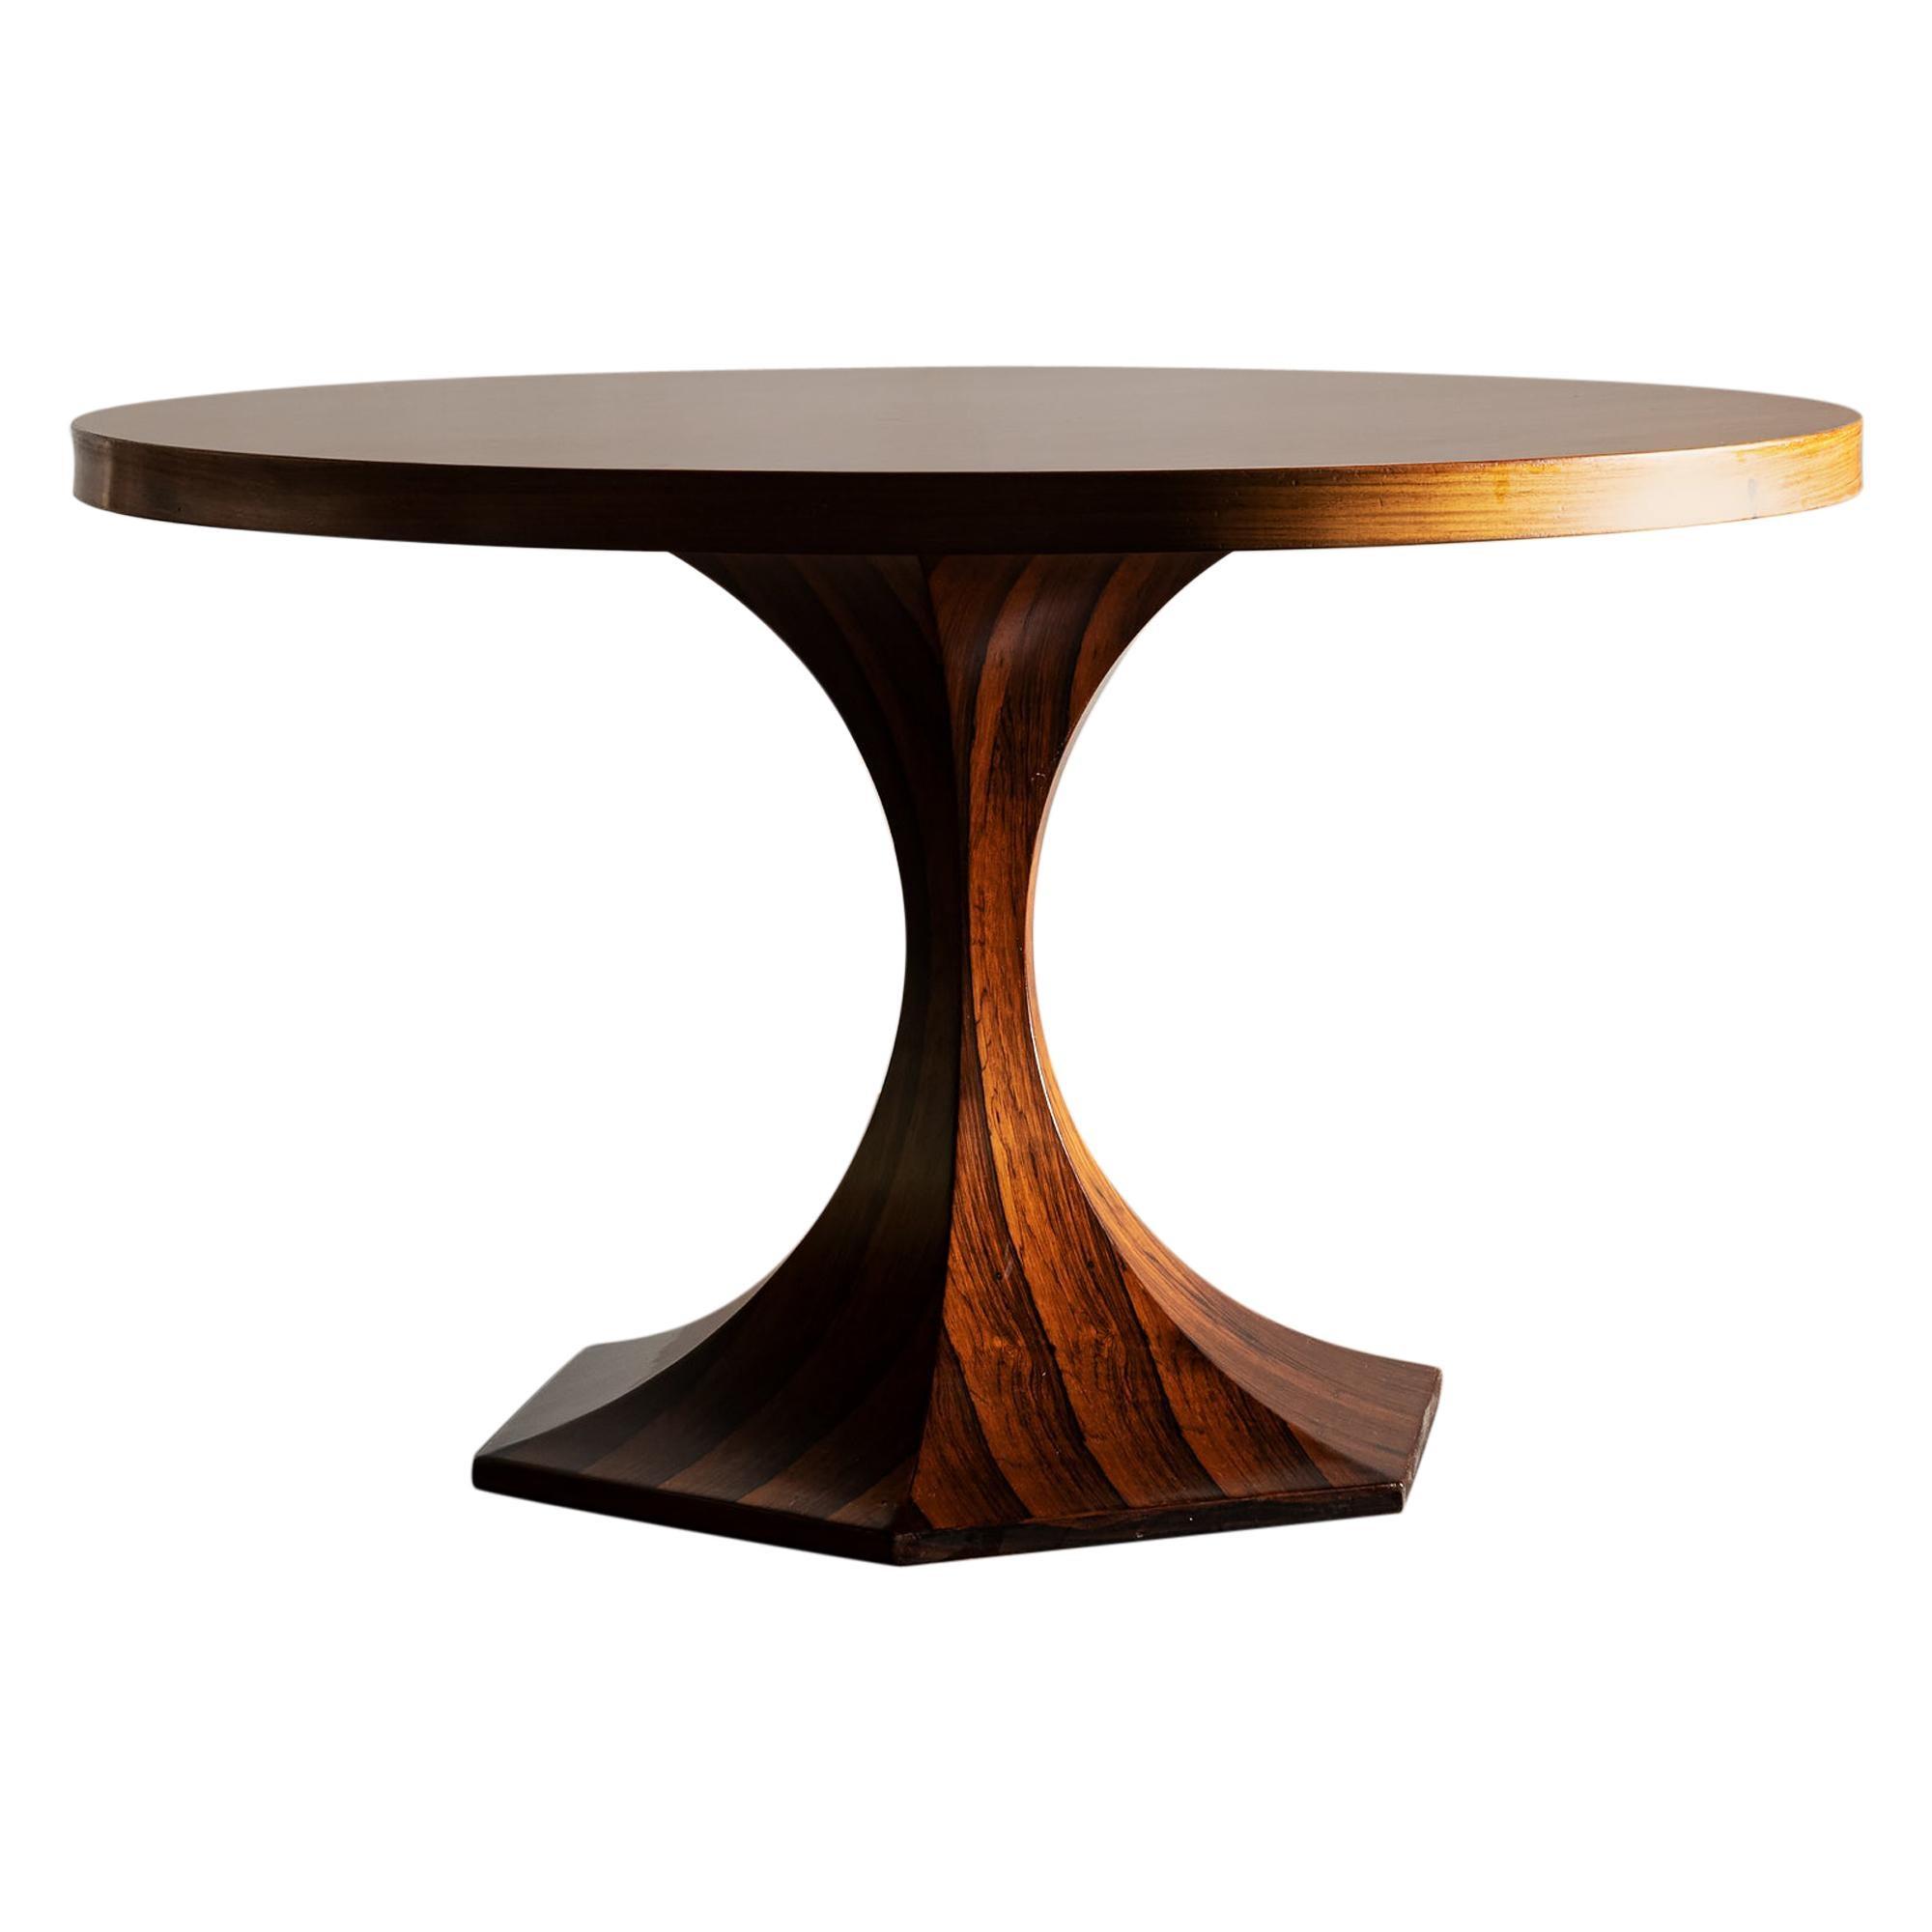 Stunning Carlo de Carli Round Rosewood Table, Italy, 1950s